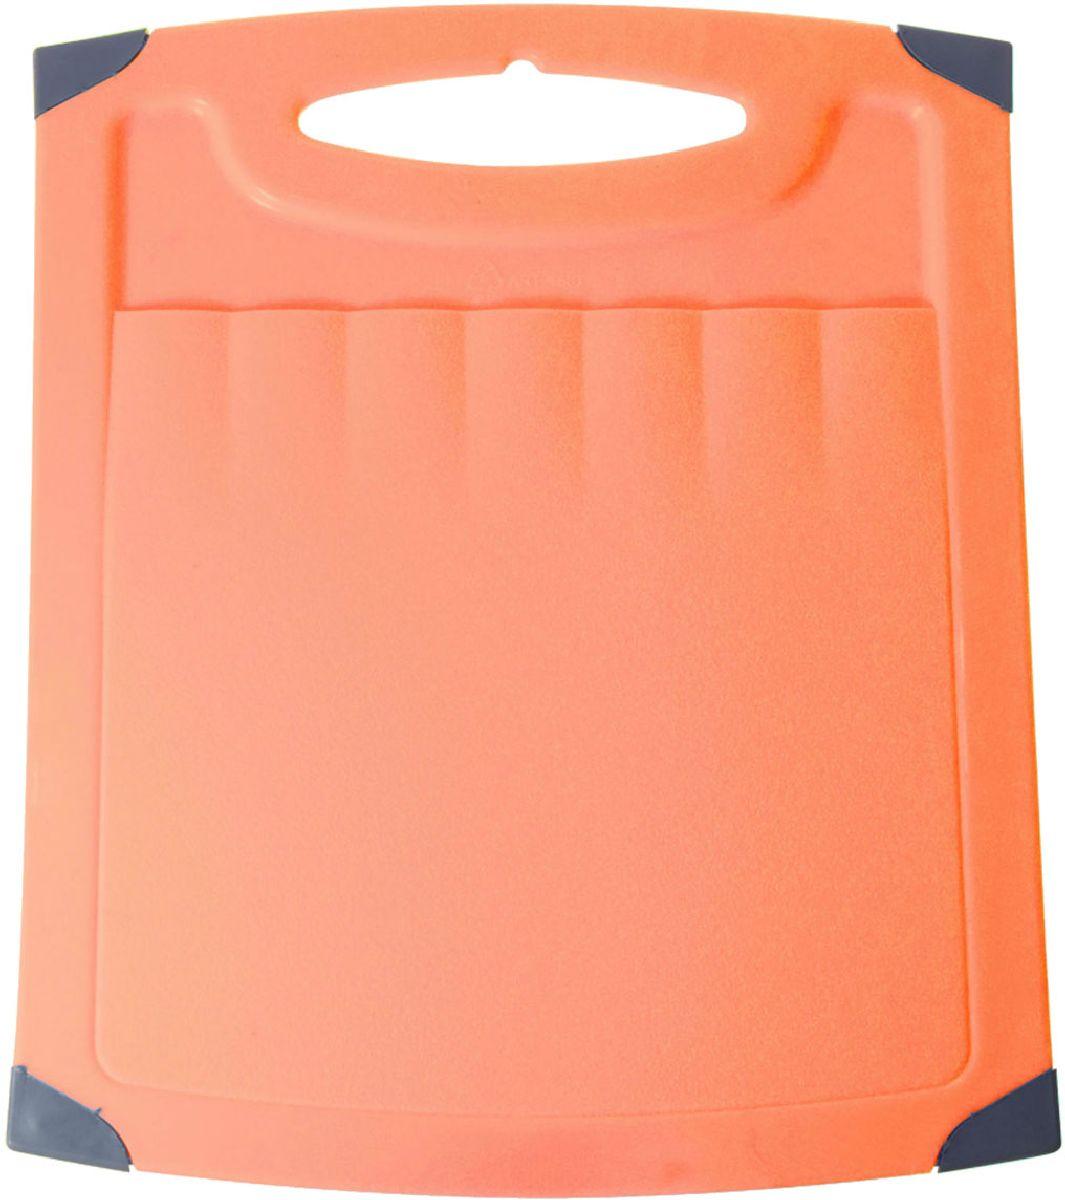 Доска разделочная Plastic Centre Люкс, цвет: оранжевый, 40 х 30 см доска разделочная plastic centre люкс цвет мраморный диаметр 27 5 см